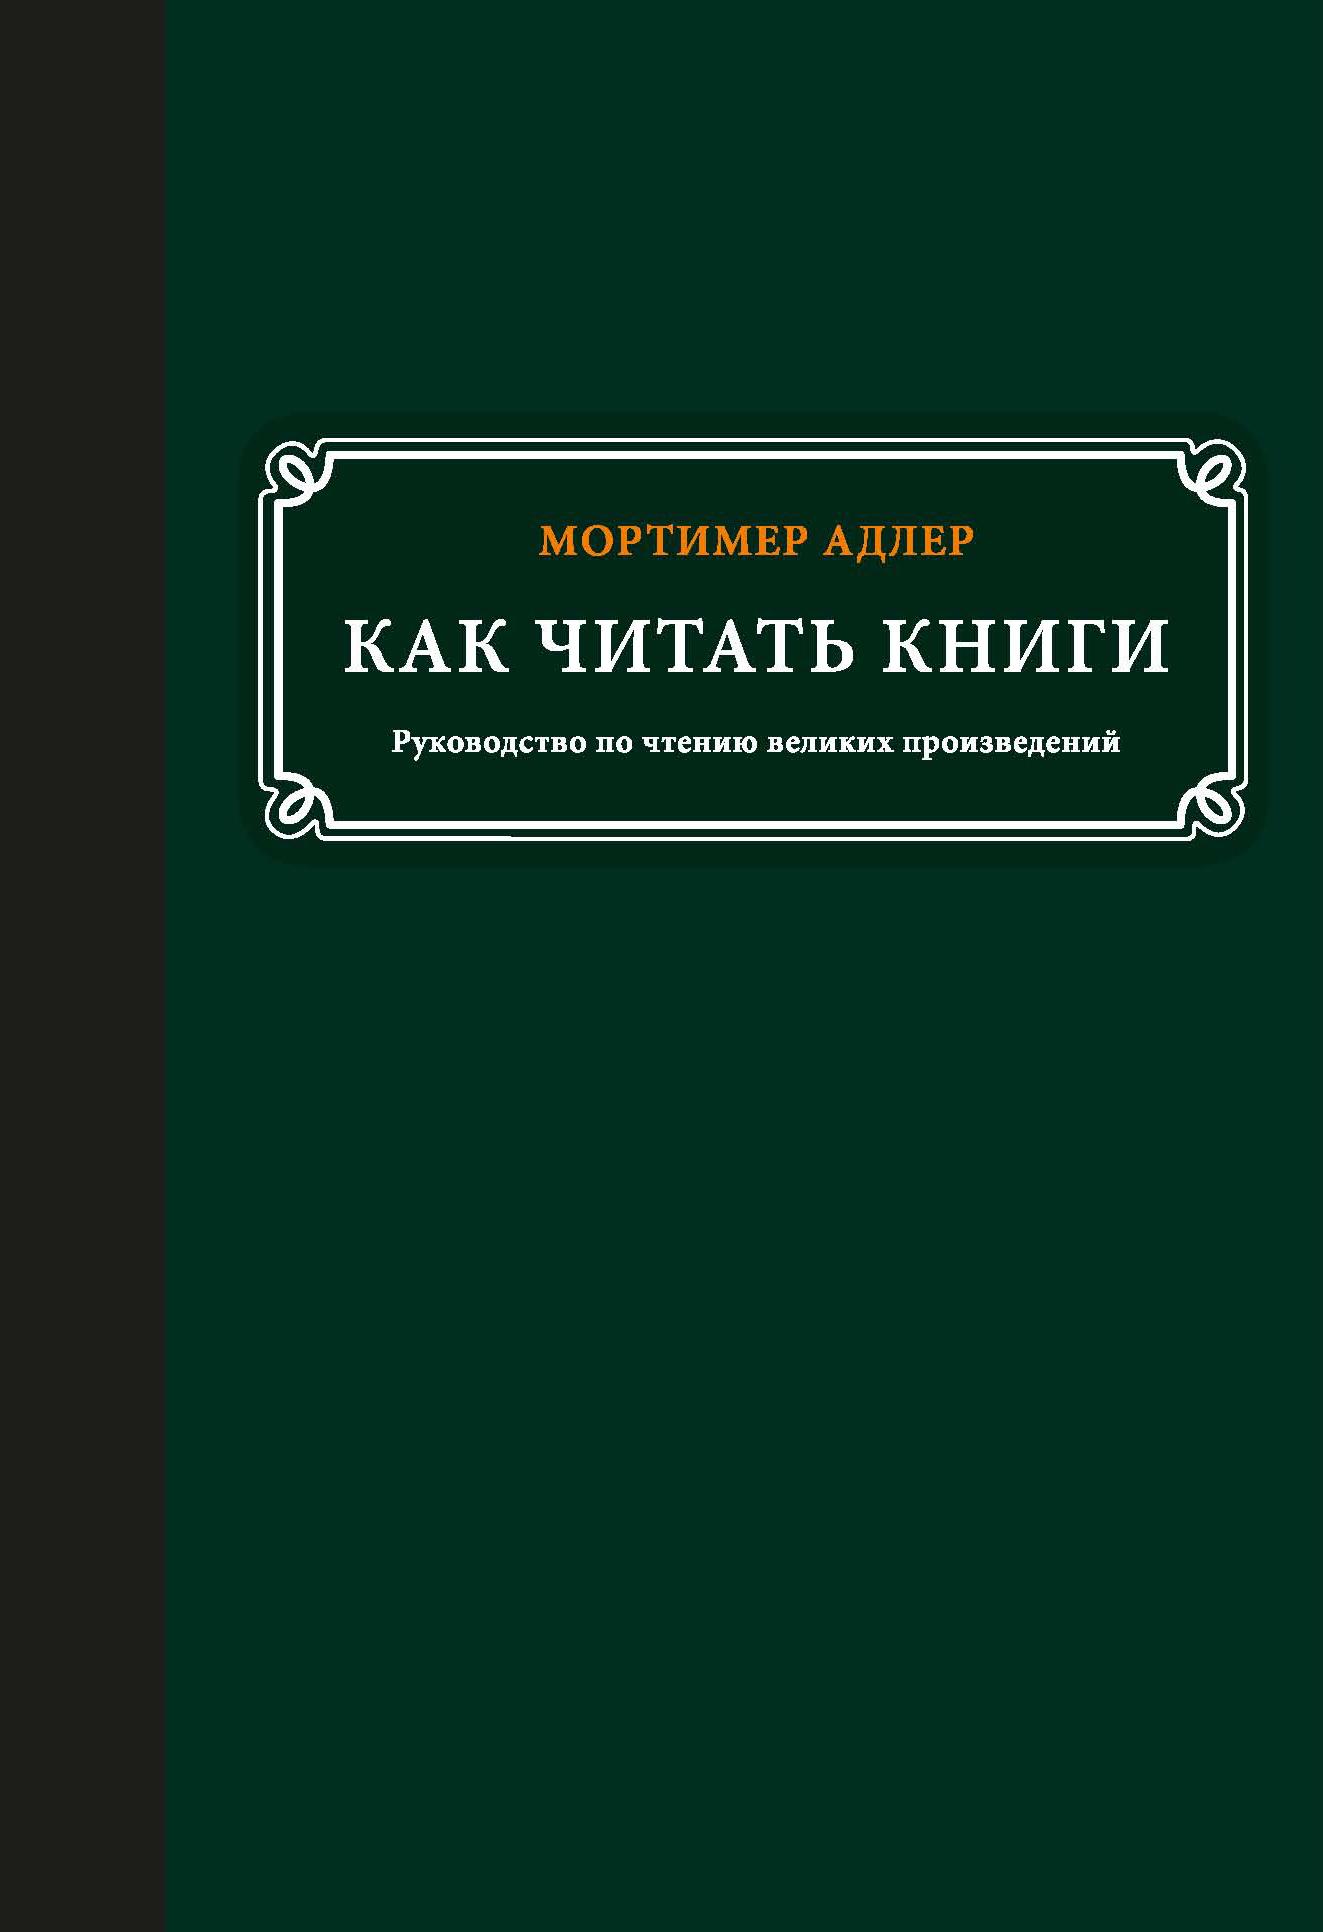 Как читать книги от book24.ru